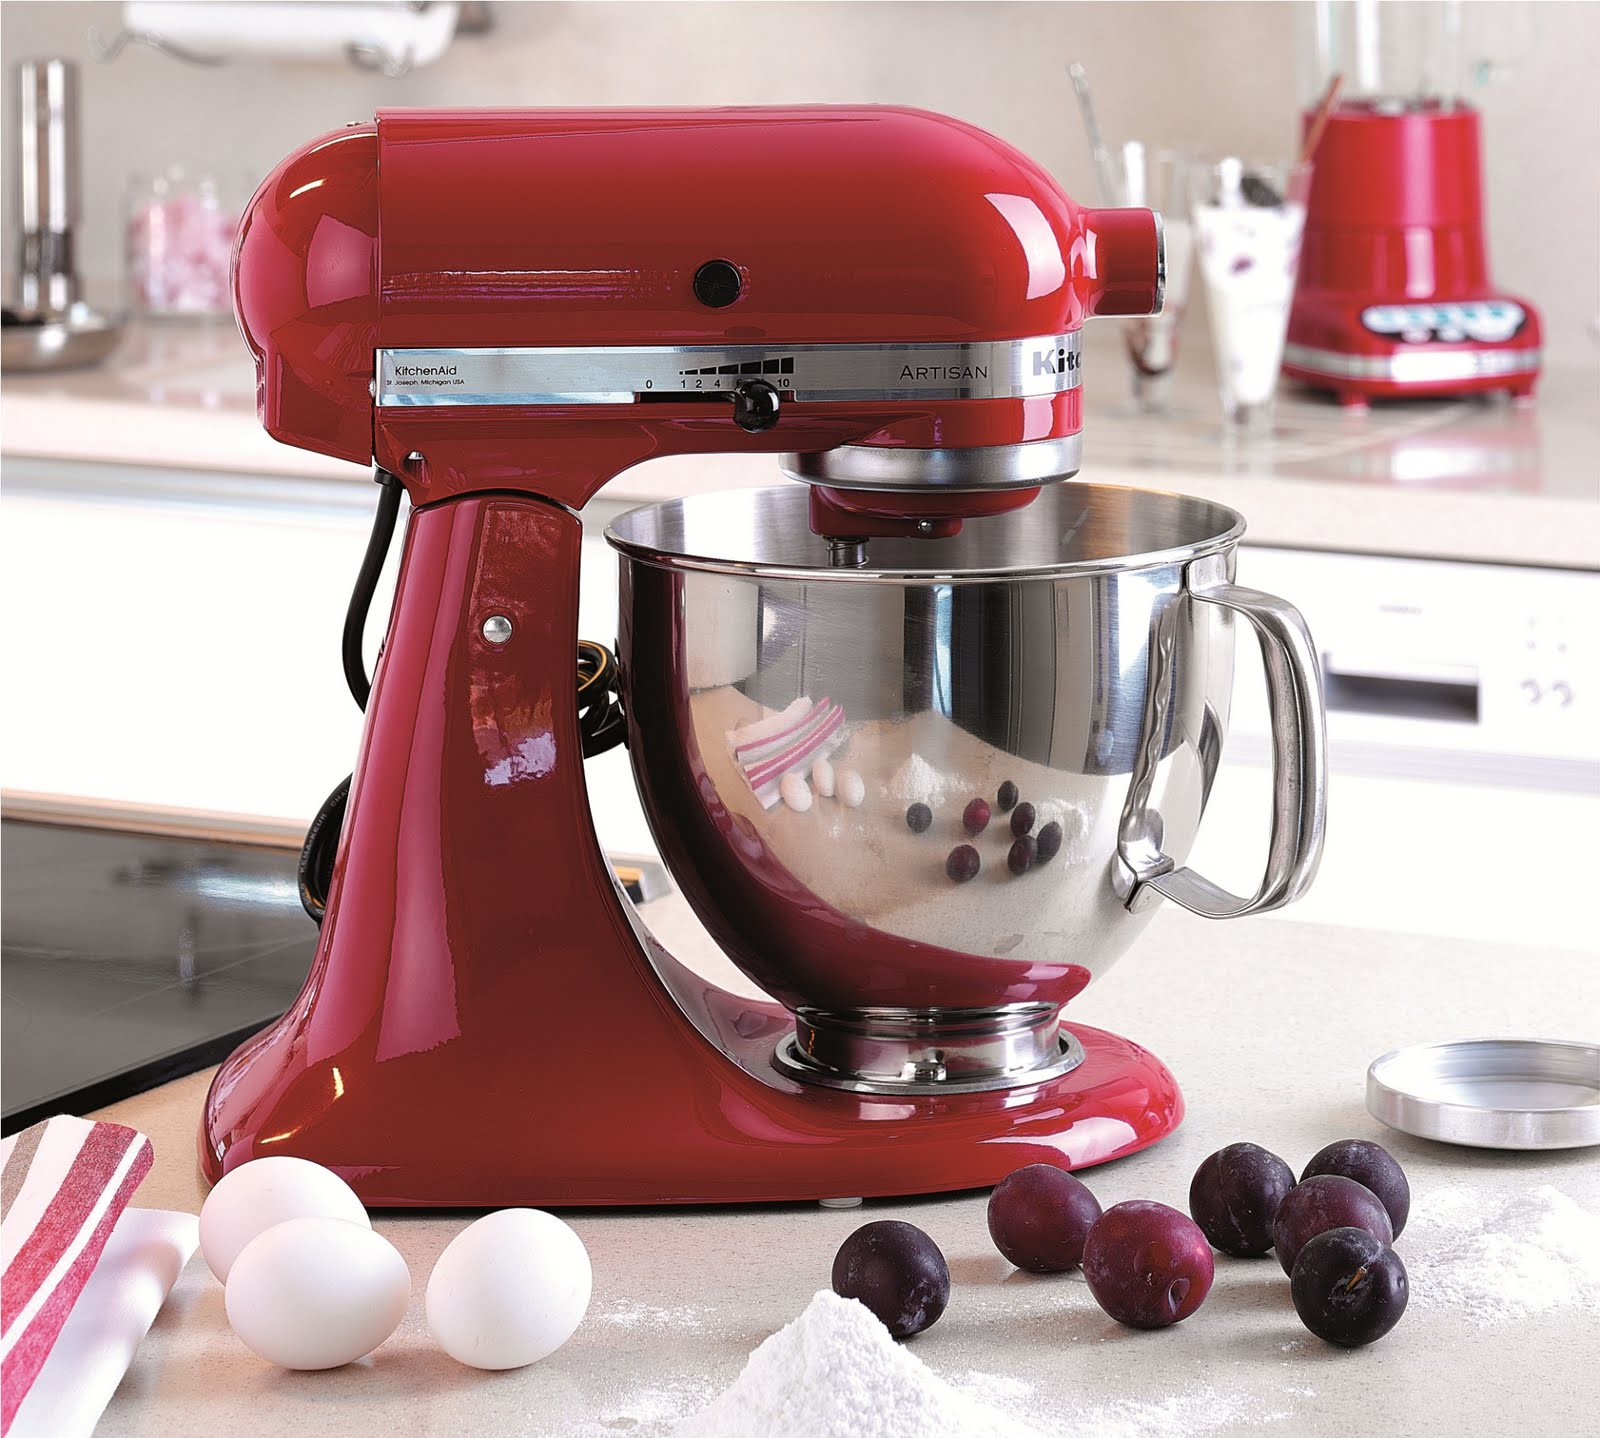 Kitchenaid white mixer photo - 2